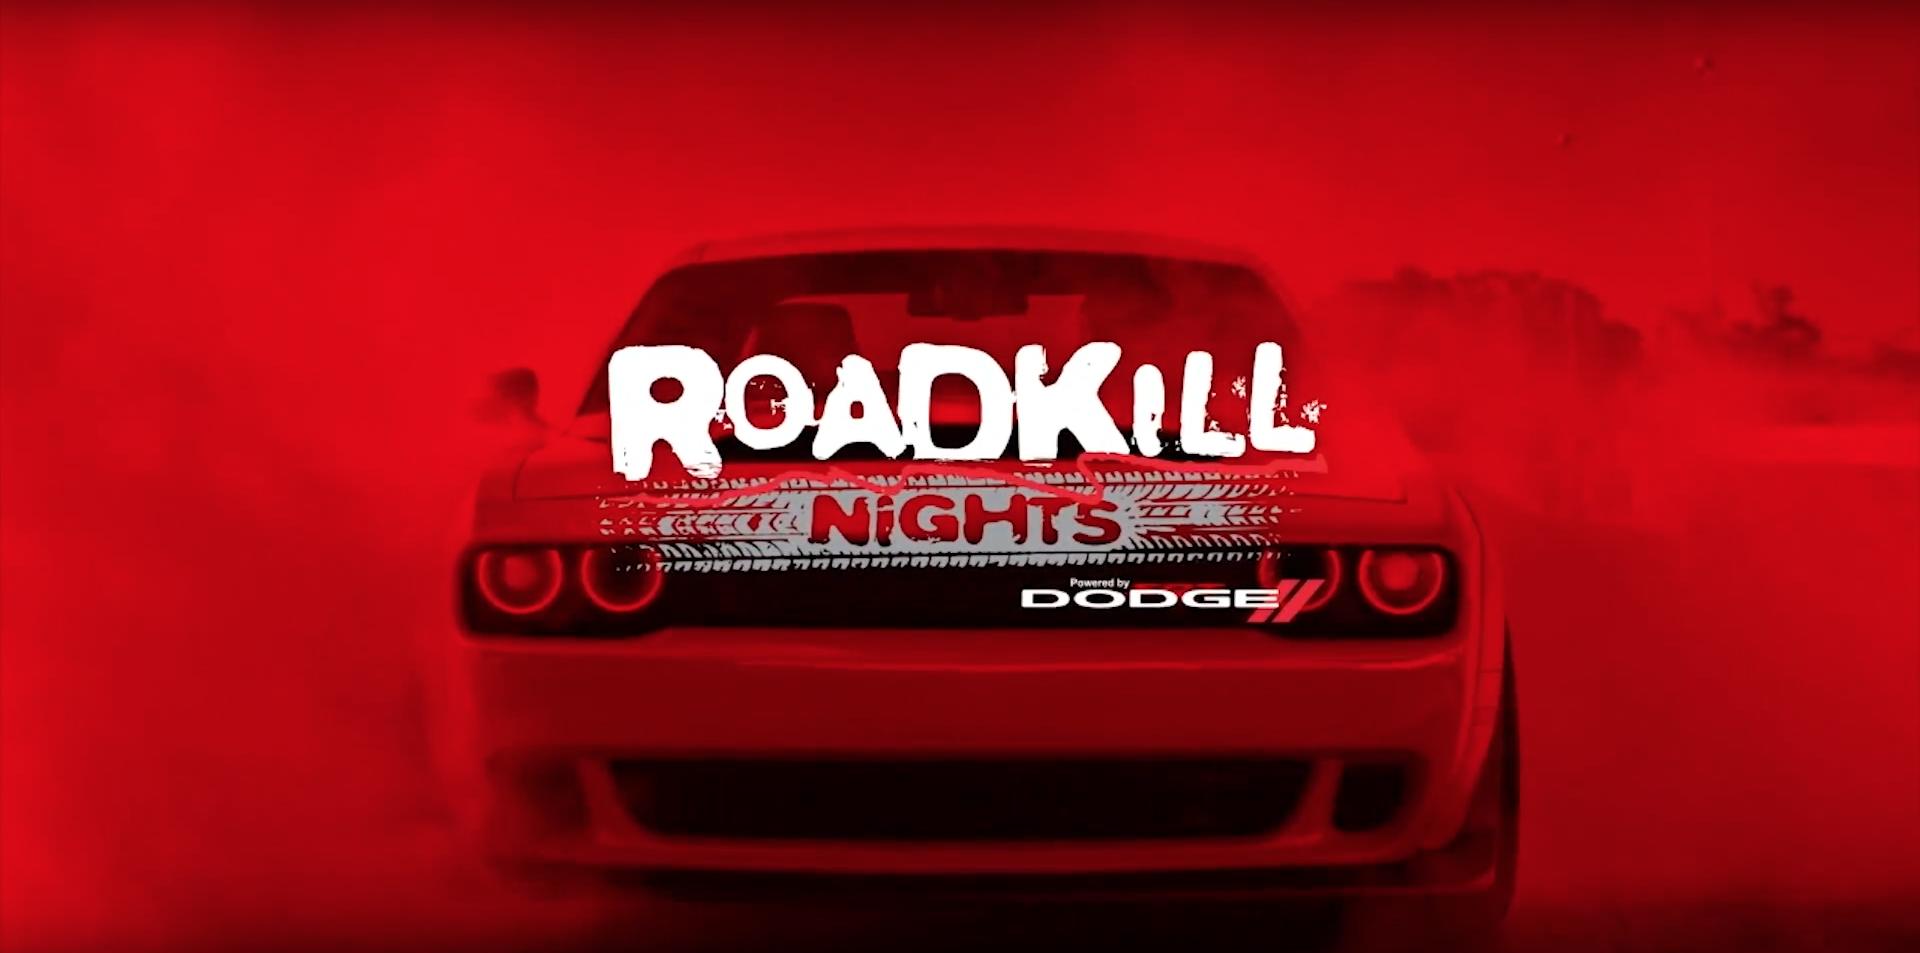 Dodge Roadkill Nights Durable Goods